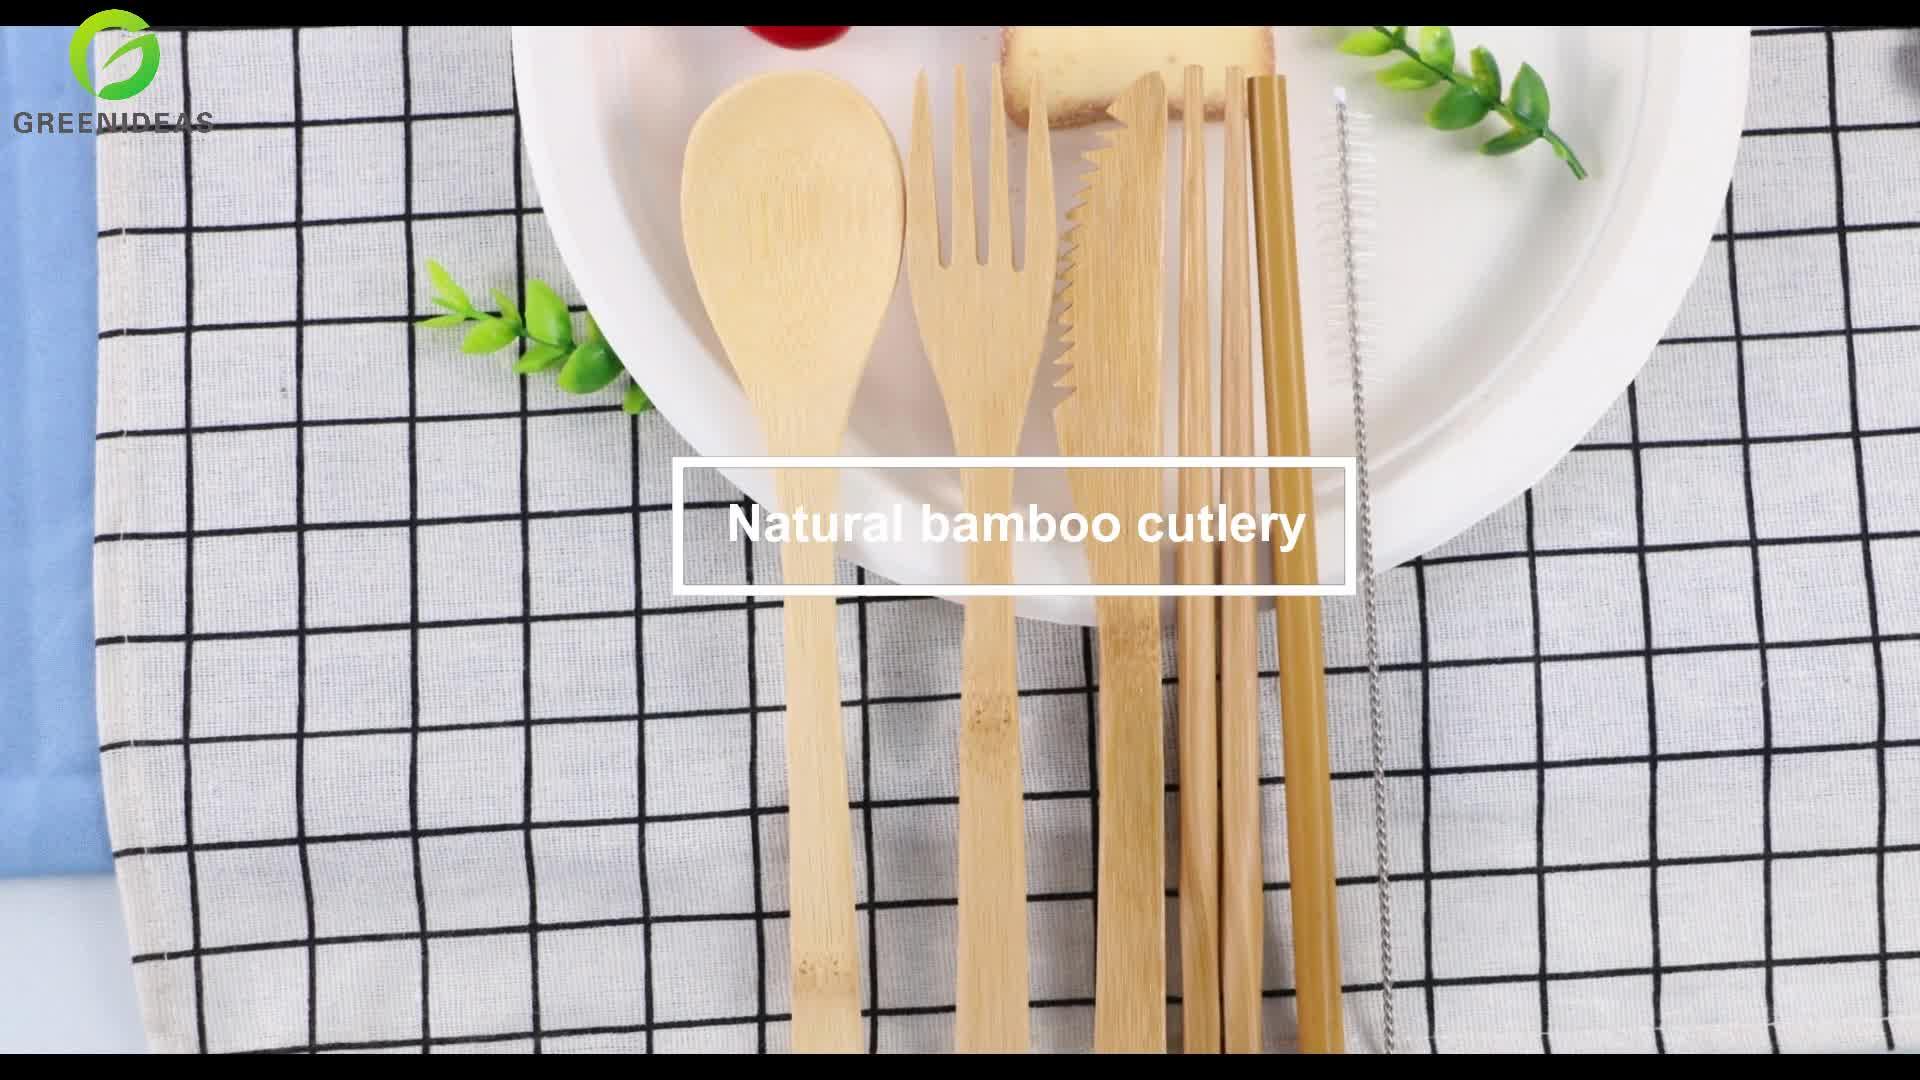 Bamboo Utensils travel Cutlery Set Eco-Friendly  Wooden Outdoor Portable Utensils Zero waste bamboo cutlery set